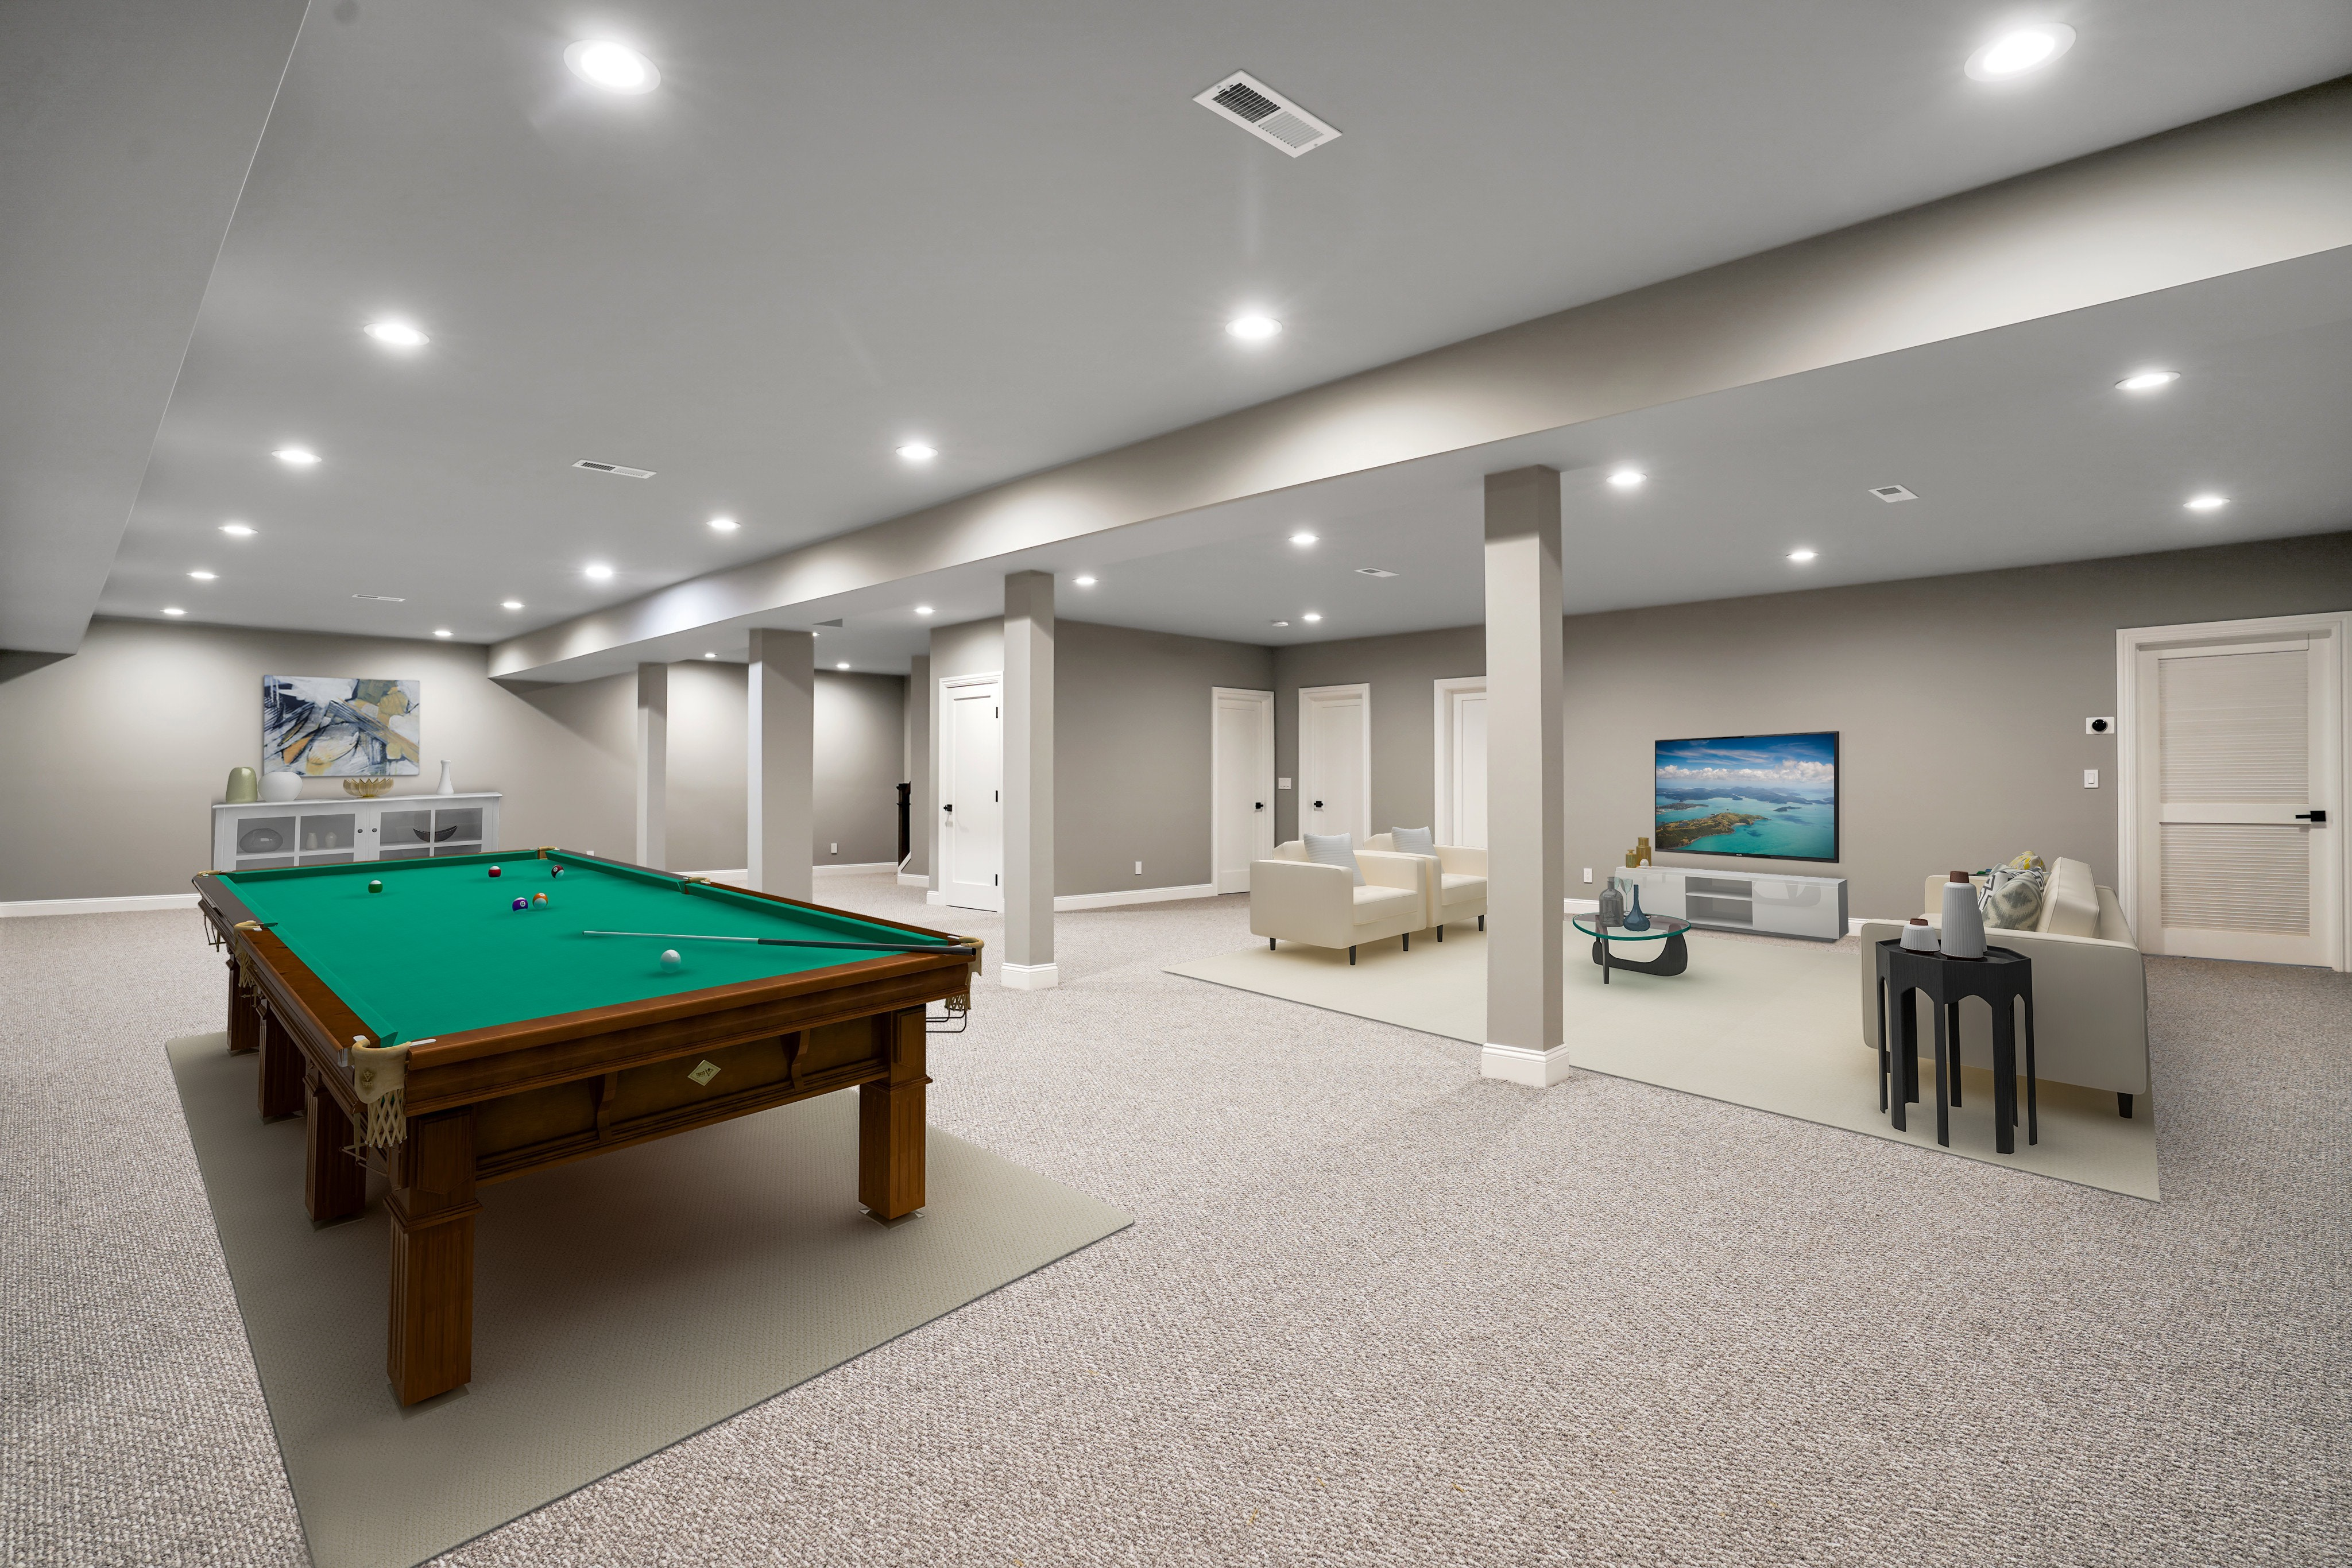 281 Hartshorn Drive Lower Level Recreation Room